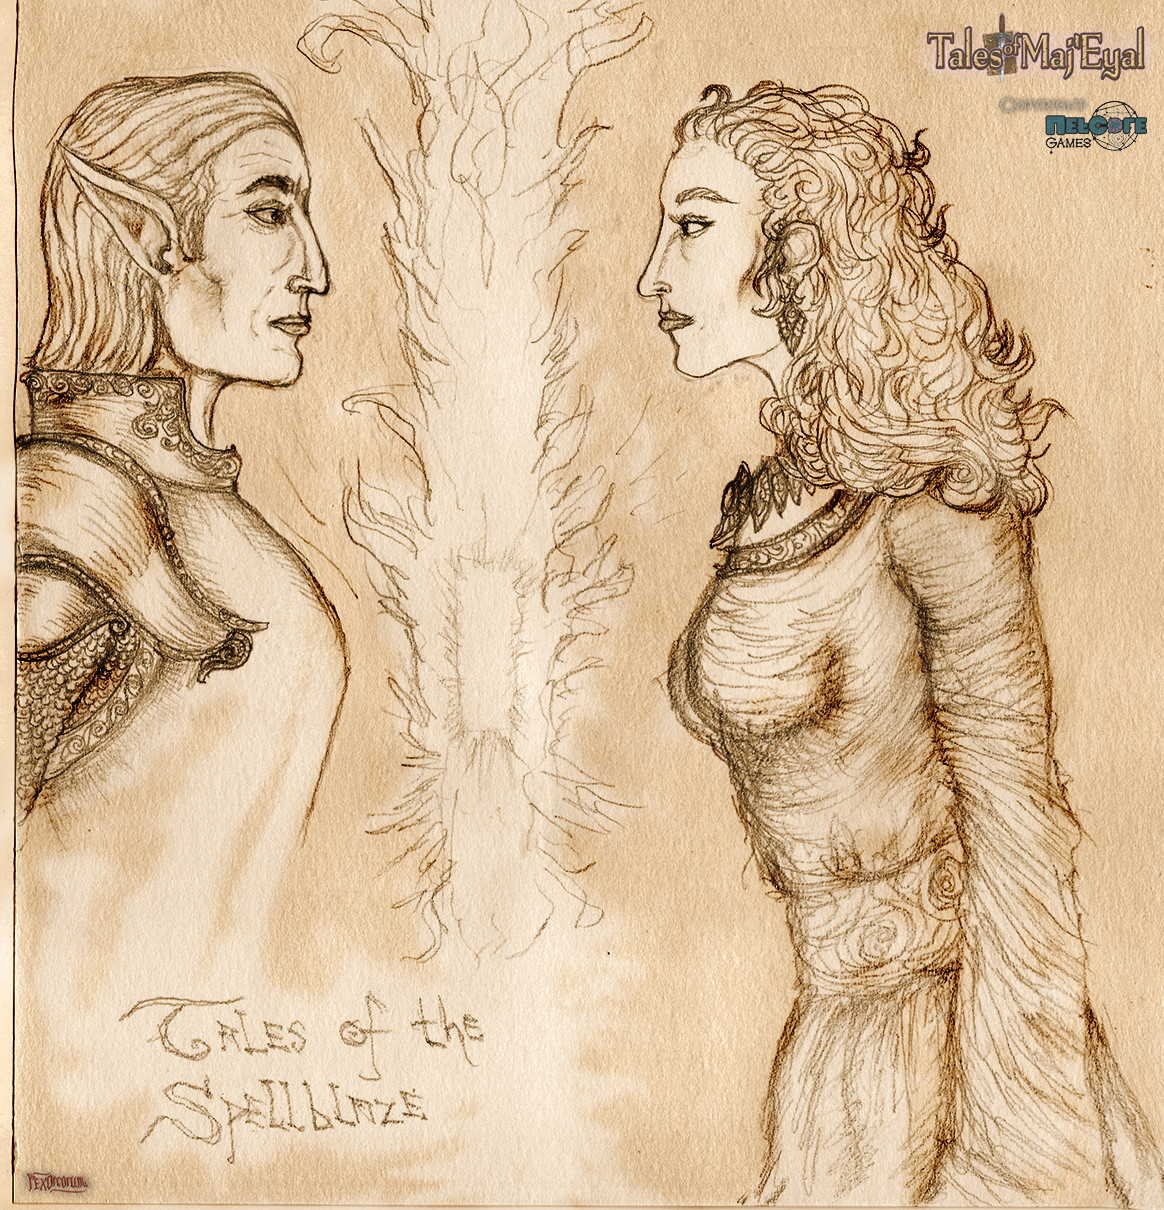 The Spellblaze Chronicles